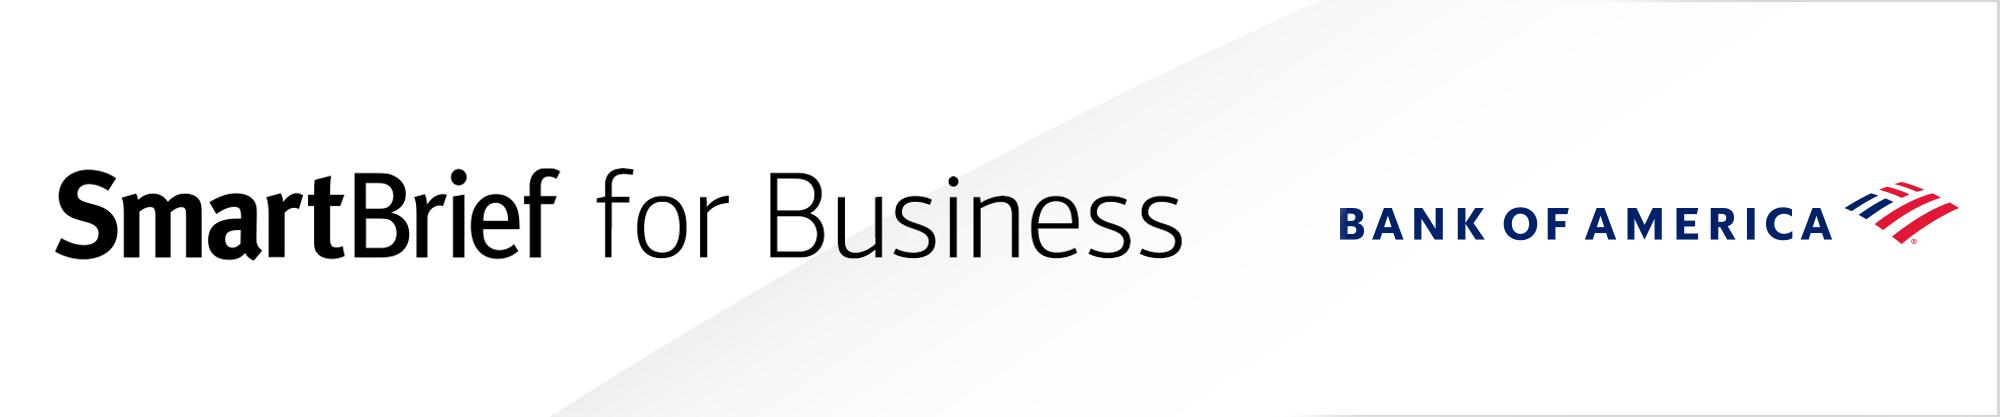 SmartBrief for Business